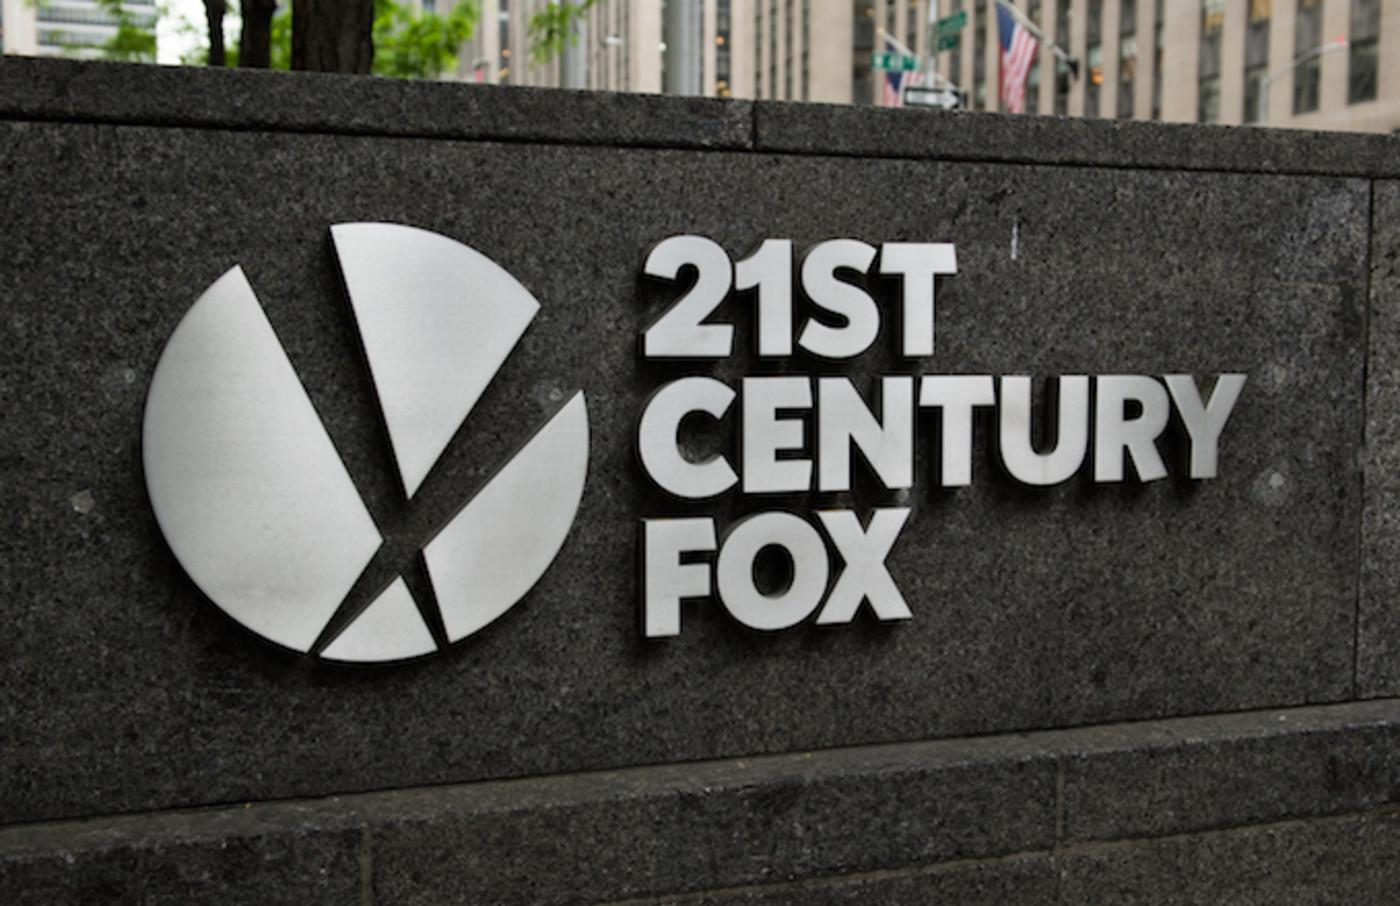 21st Century Fox logo